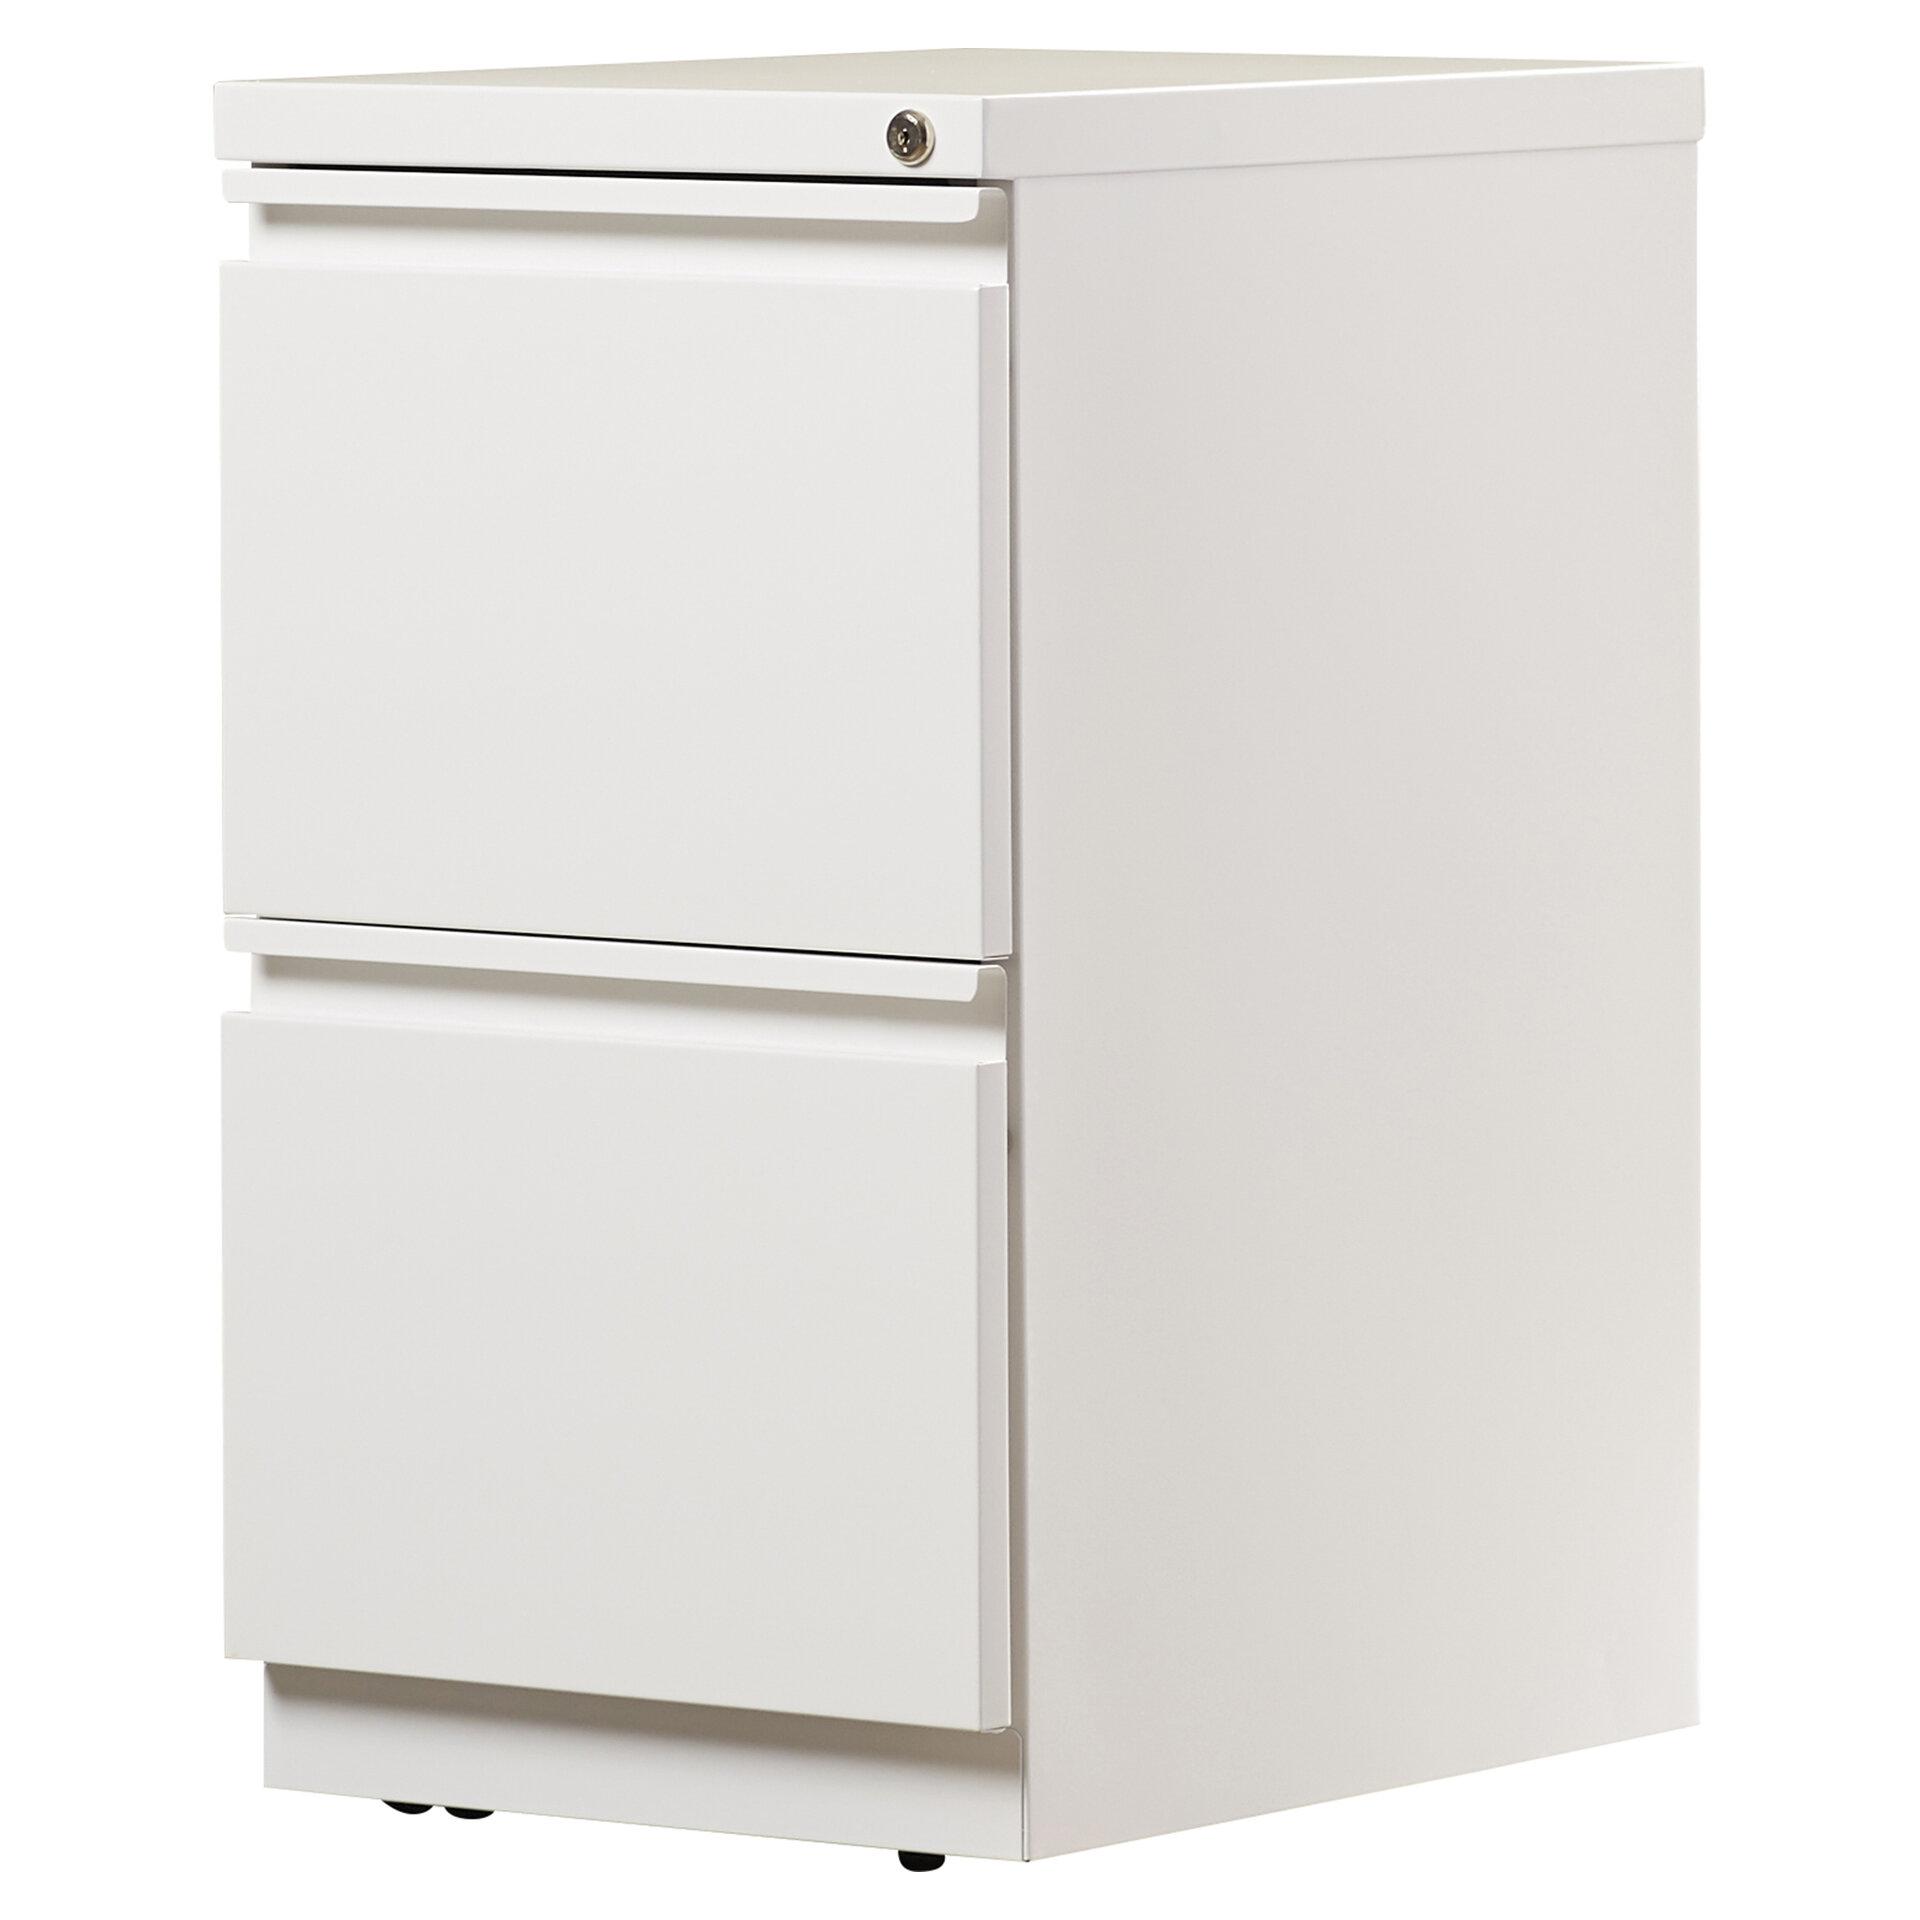 2 Drawer Mobile Vertical Filing Cabinet